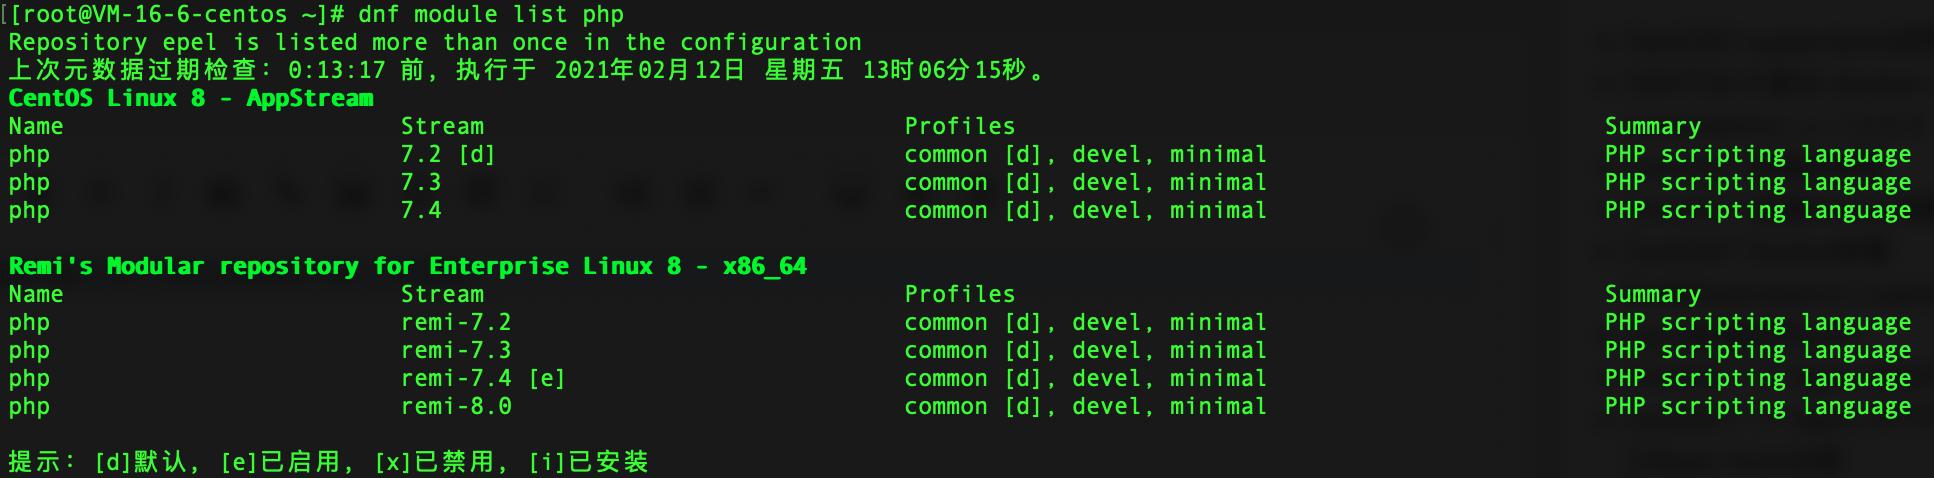 dnf module list php